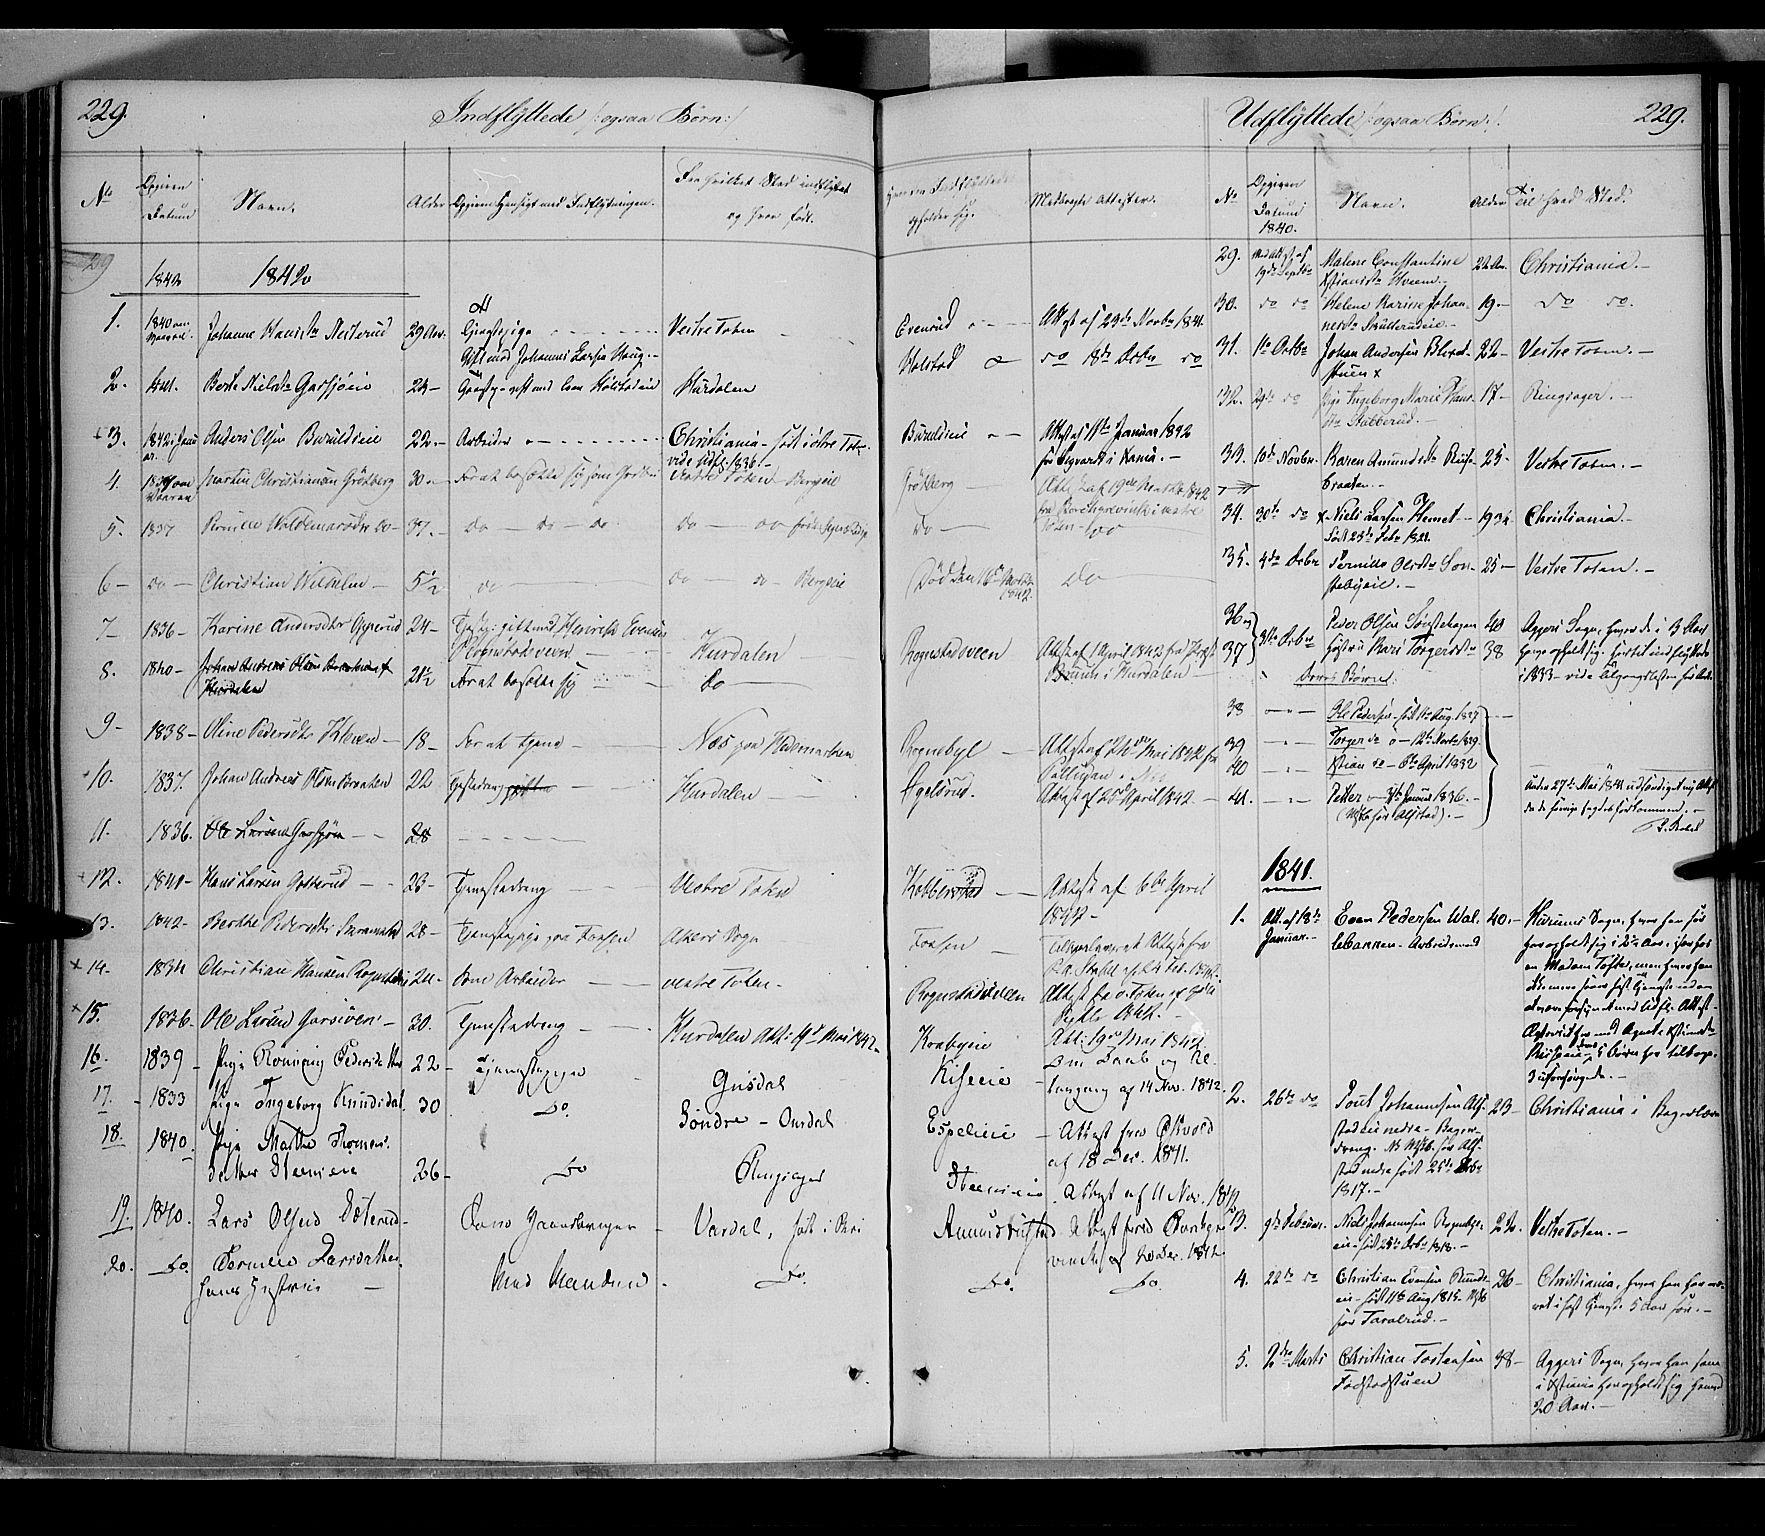 SAH, Østre Toten prestekontor, Ministerialbok nr. 2, 1840-1847, s. 229